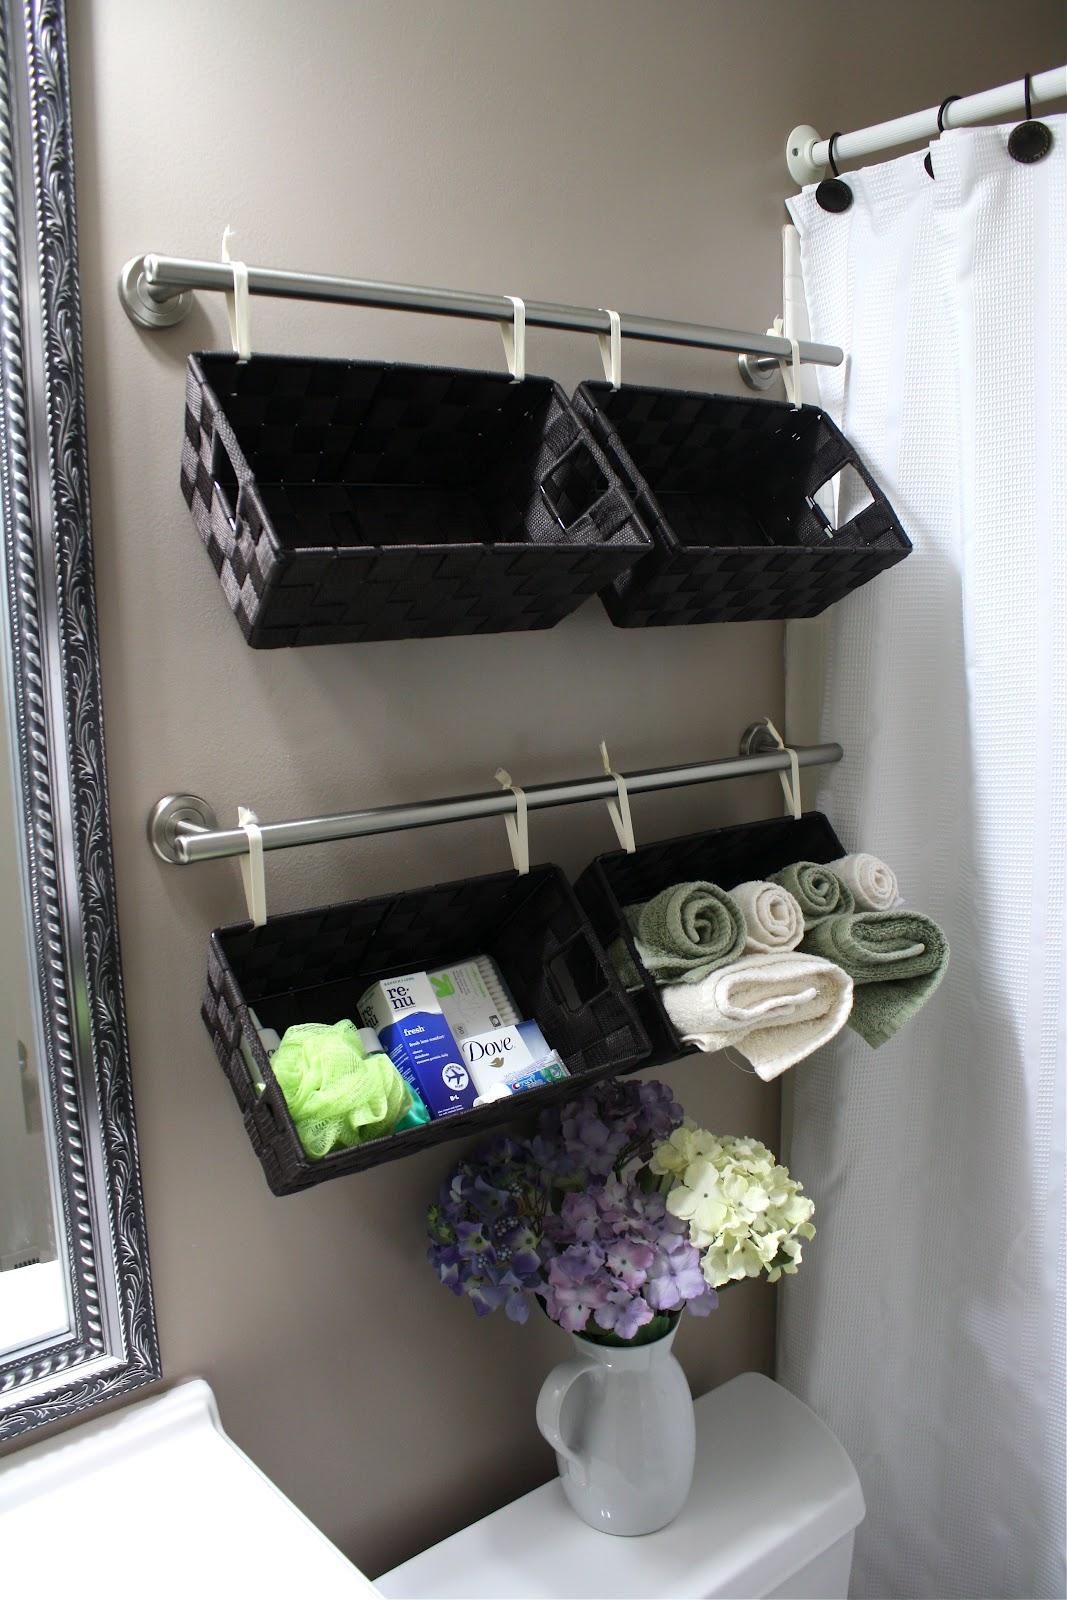 Bathroom wall organizers - Hang Baskets On The Walls